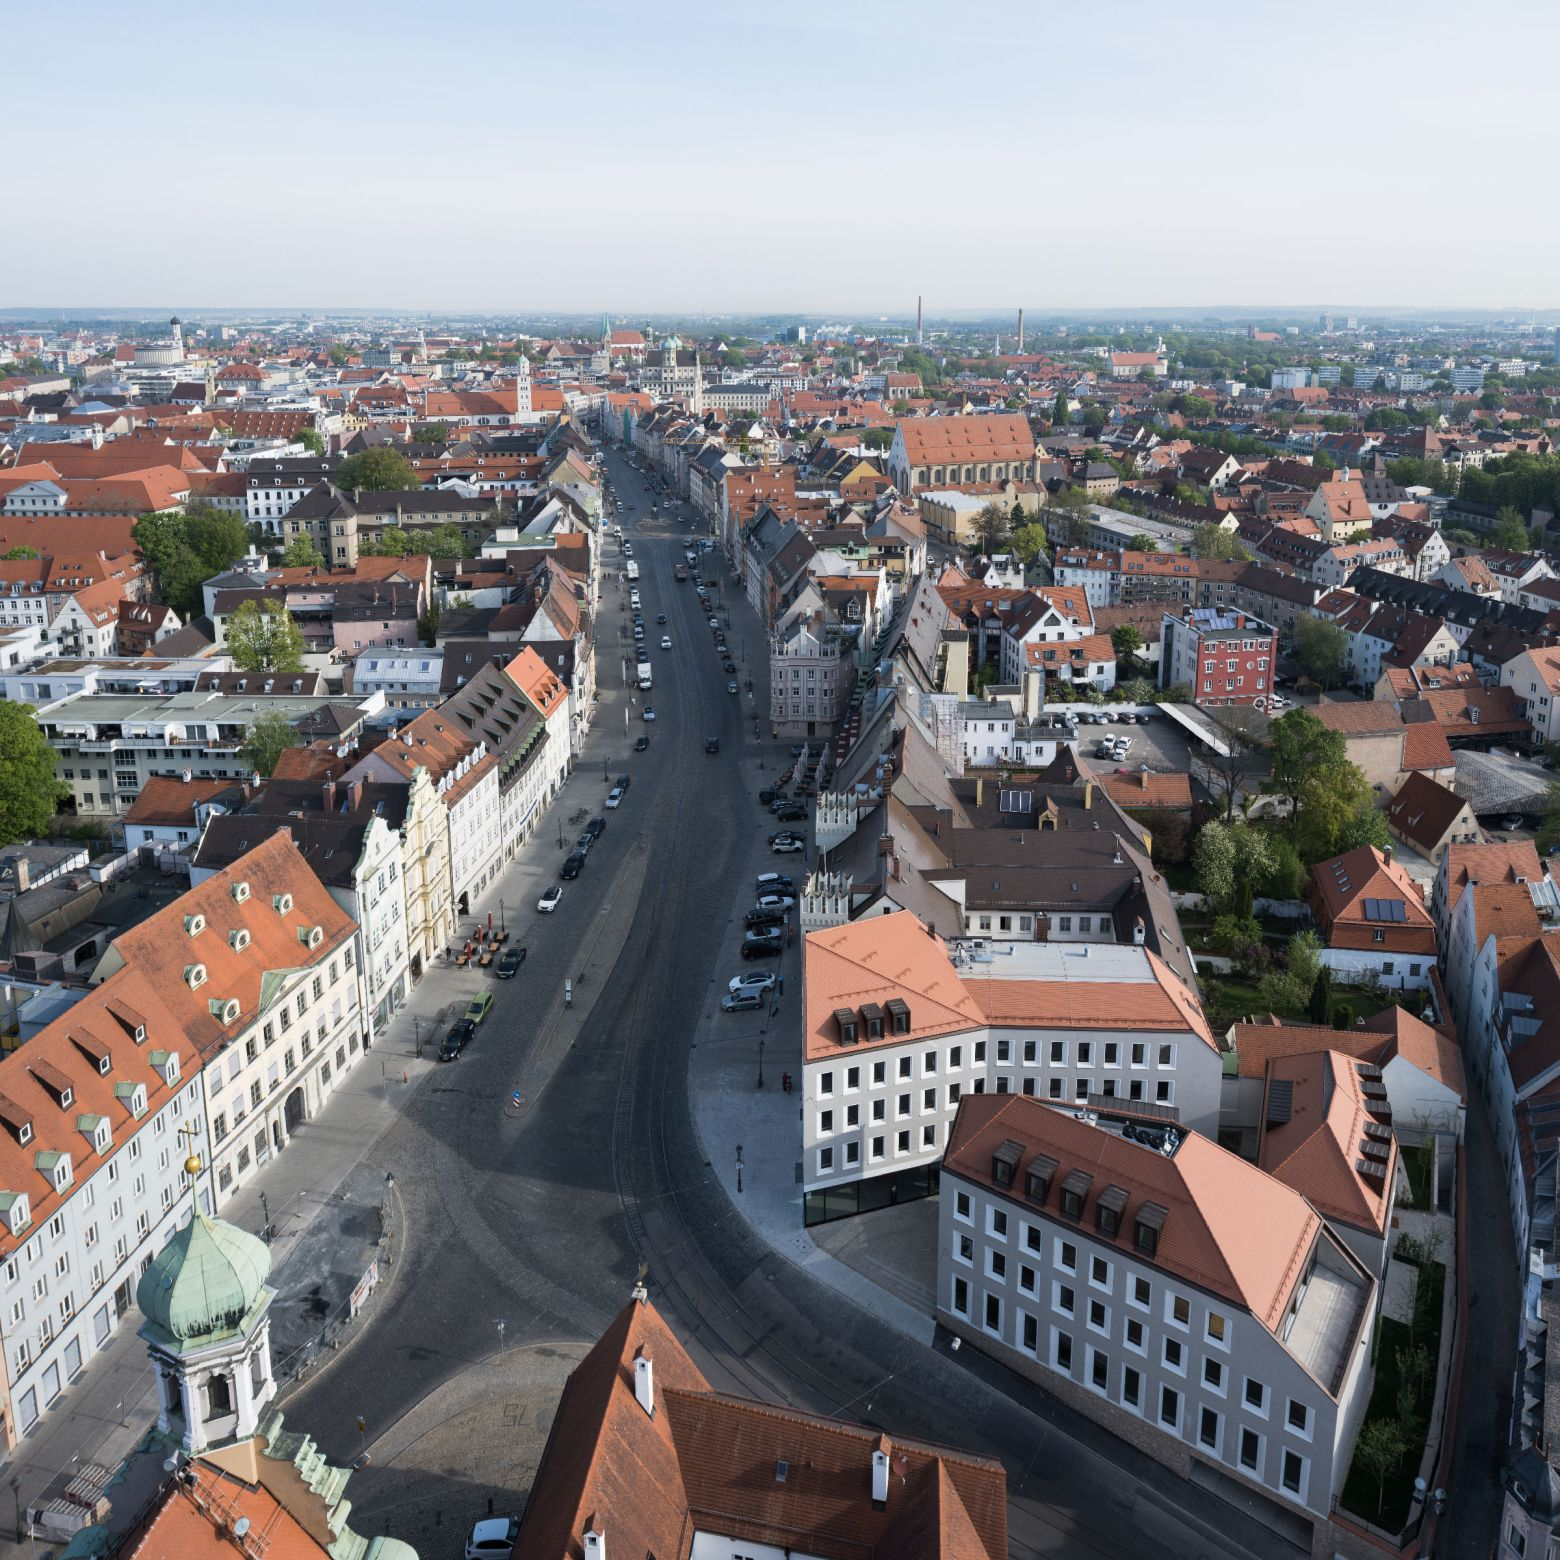 Blick vom Turm St Ulrich